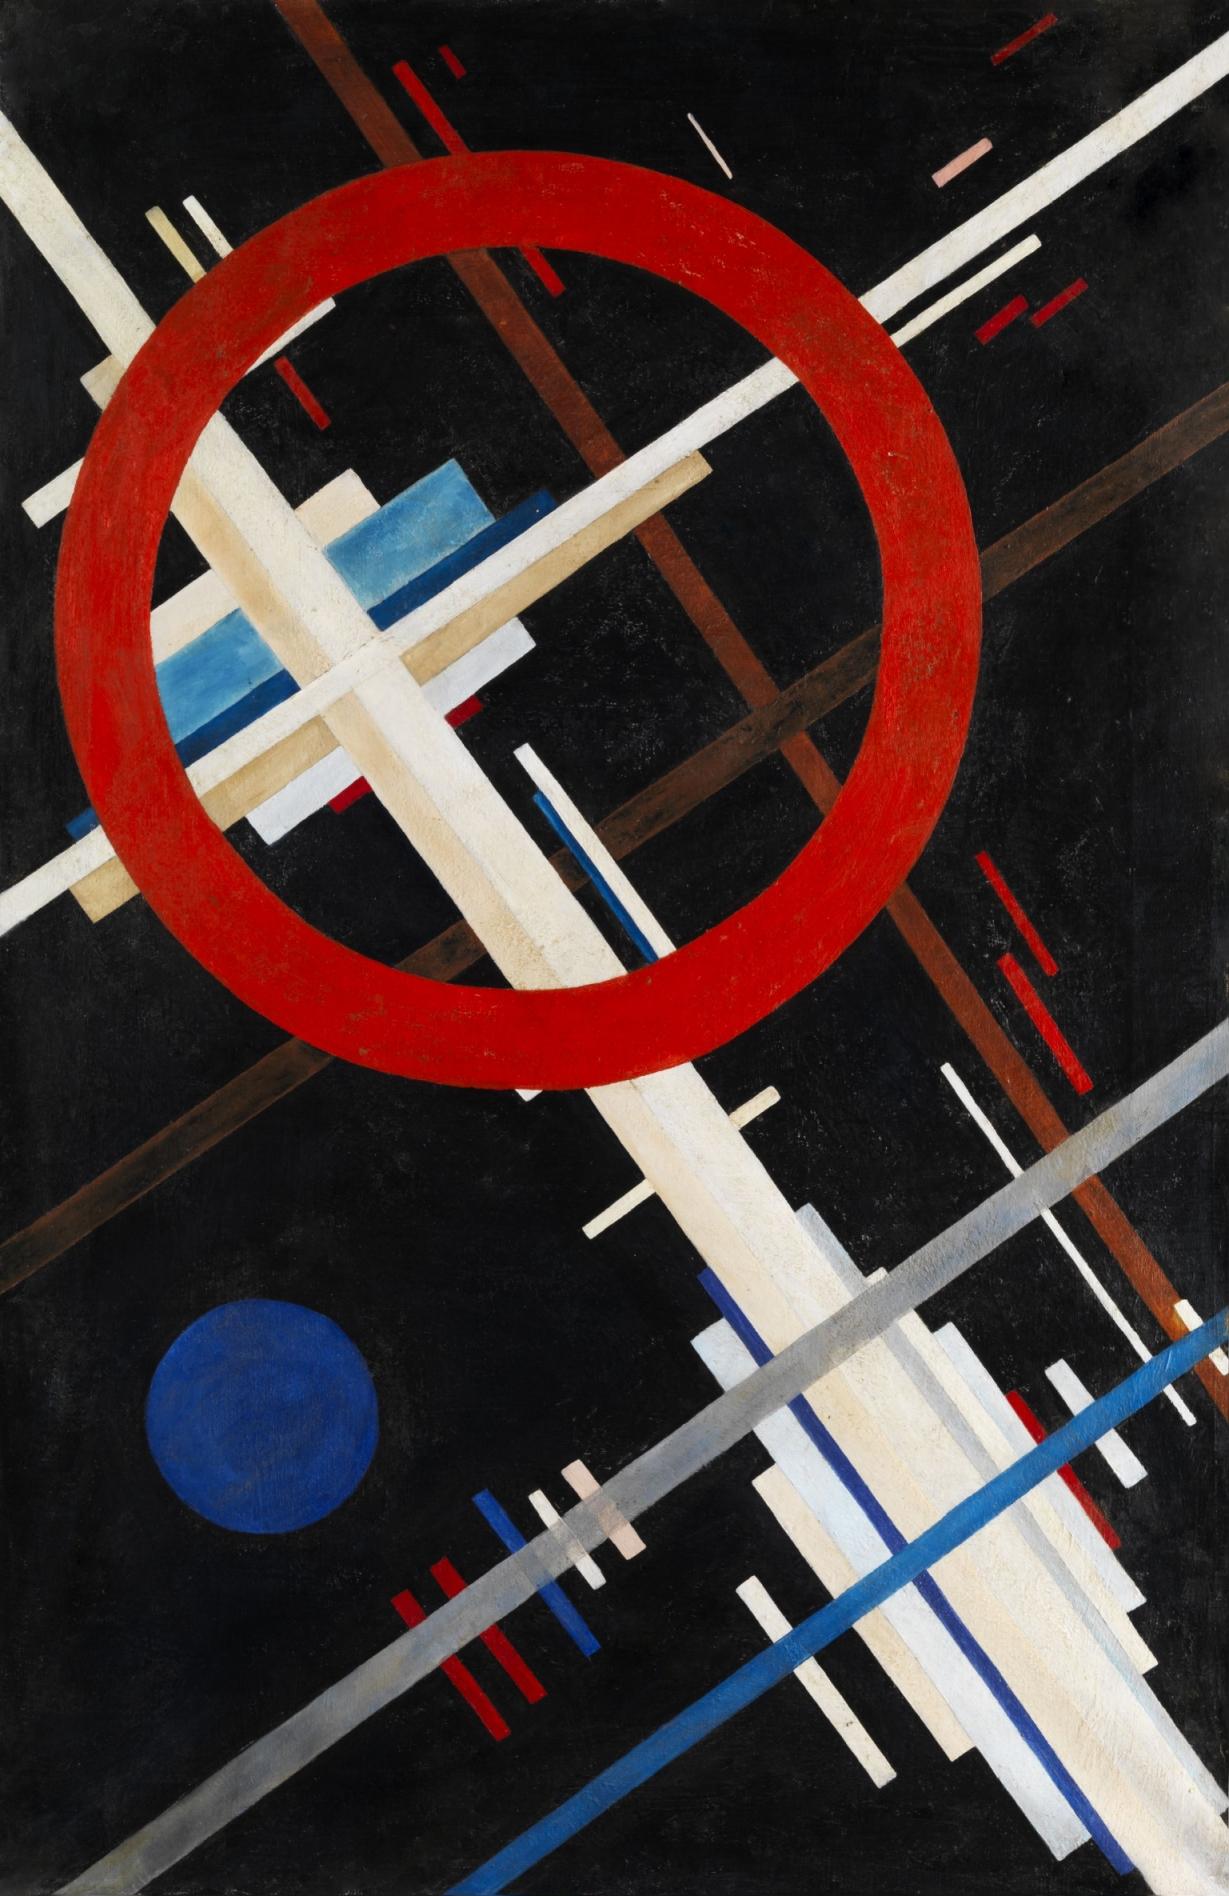 Ilya Chashnik (Илья Григорьевич Чашник) (1902 - 1929) Suprematist composition. Oil on canvas